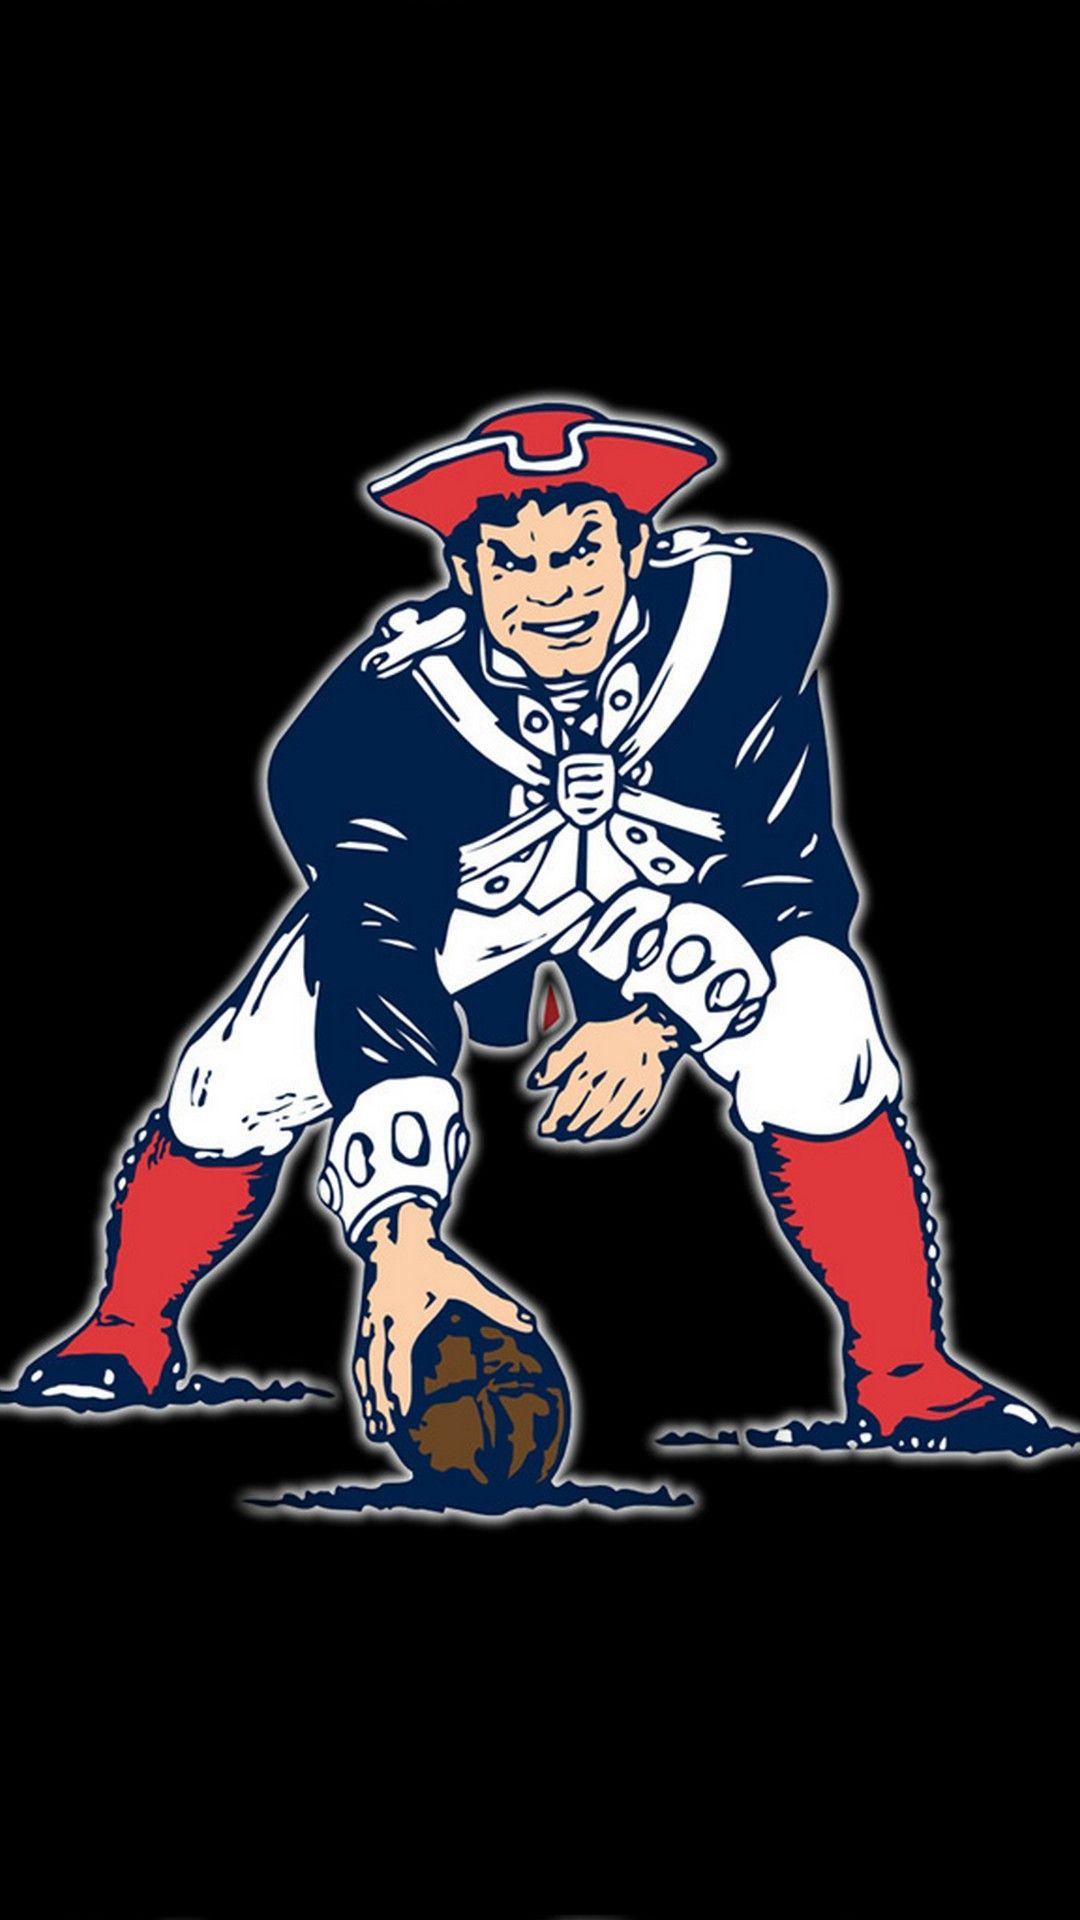 New England Patriots iPhone Wallpaper Design 2020 New